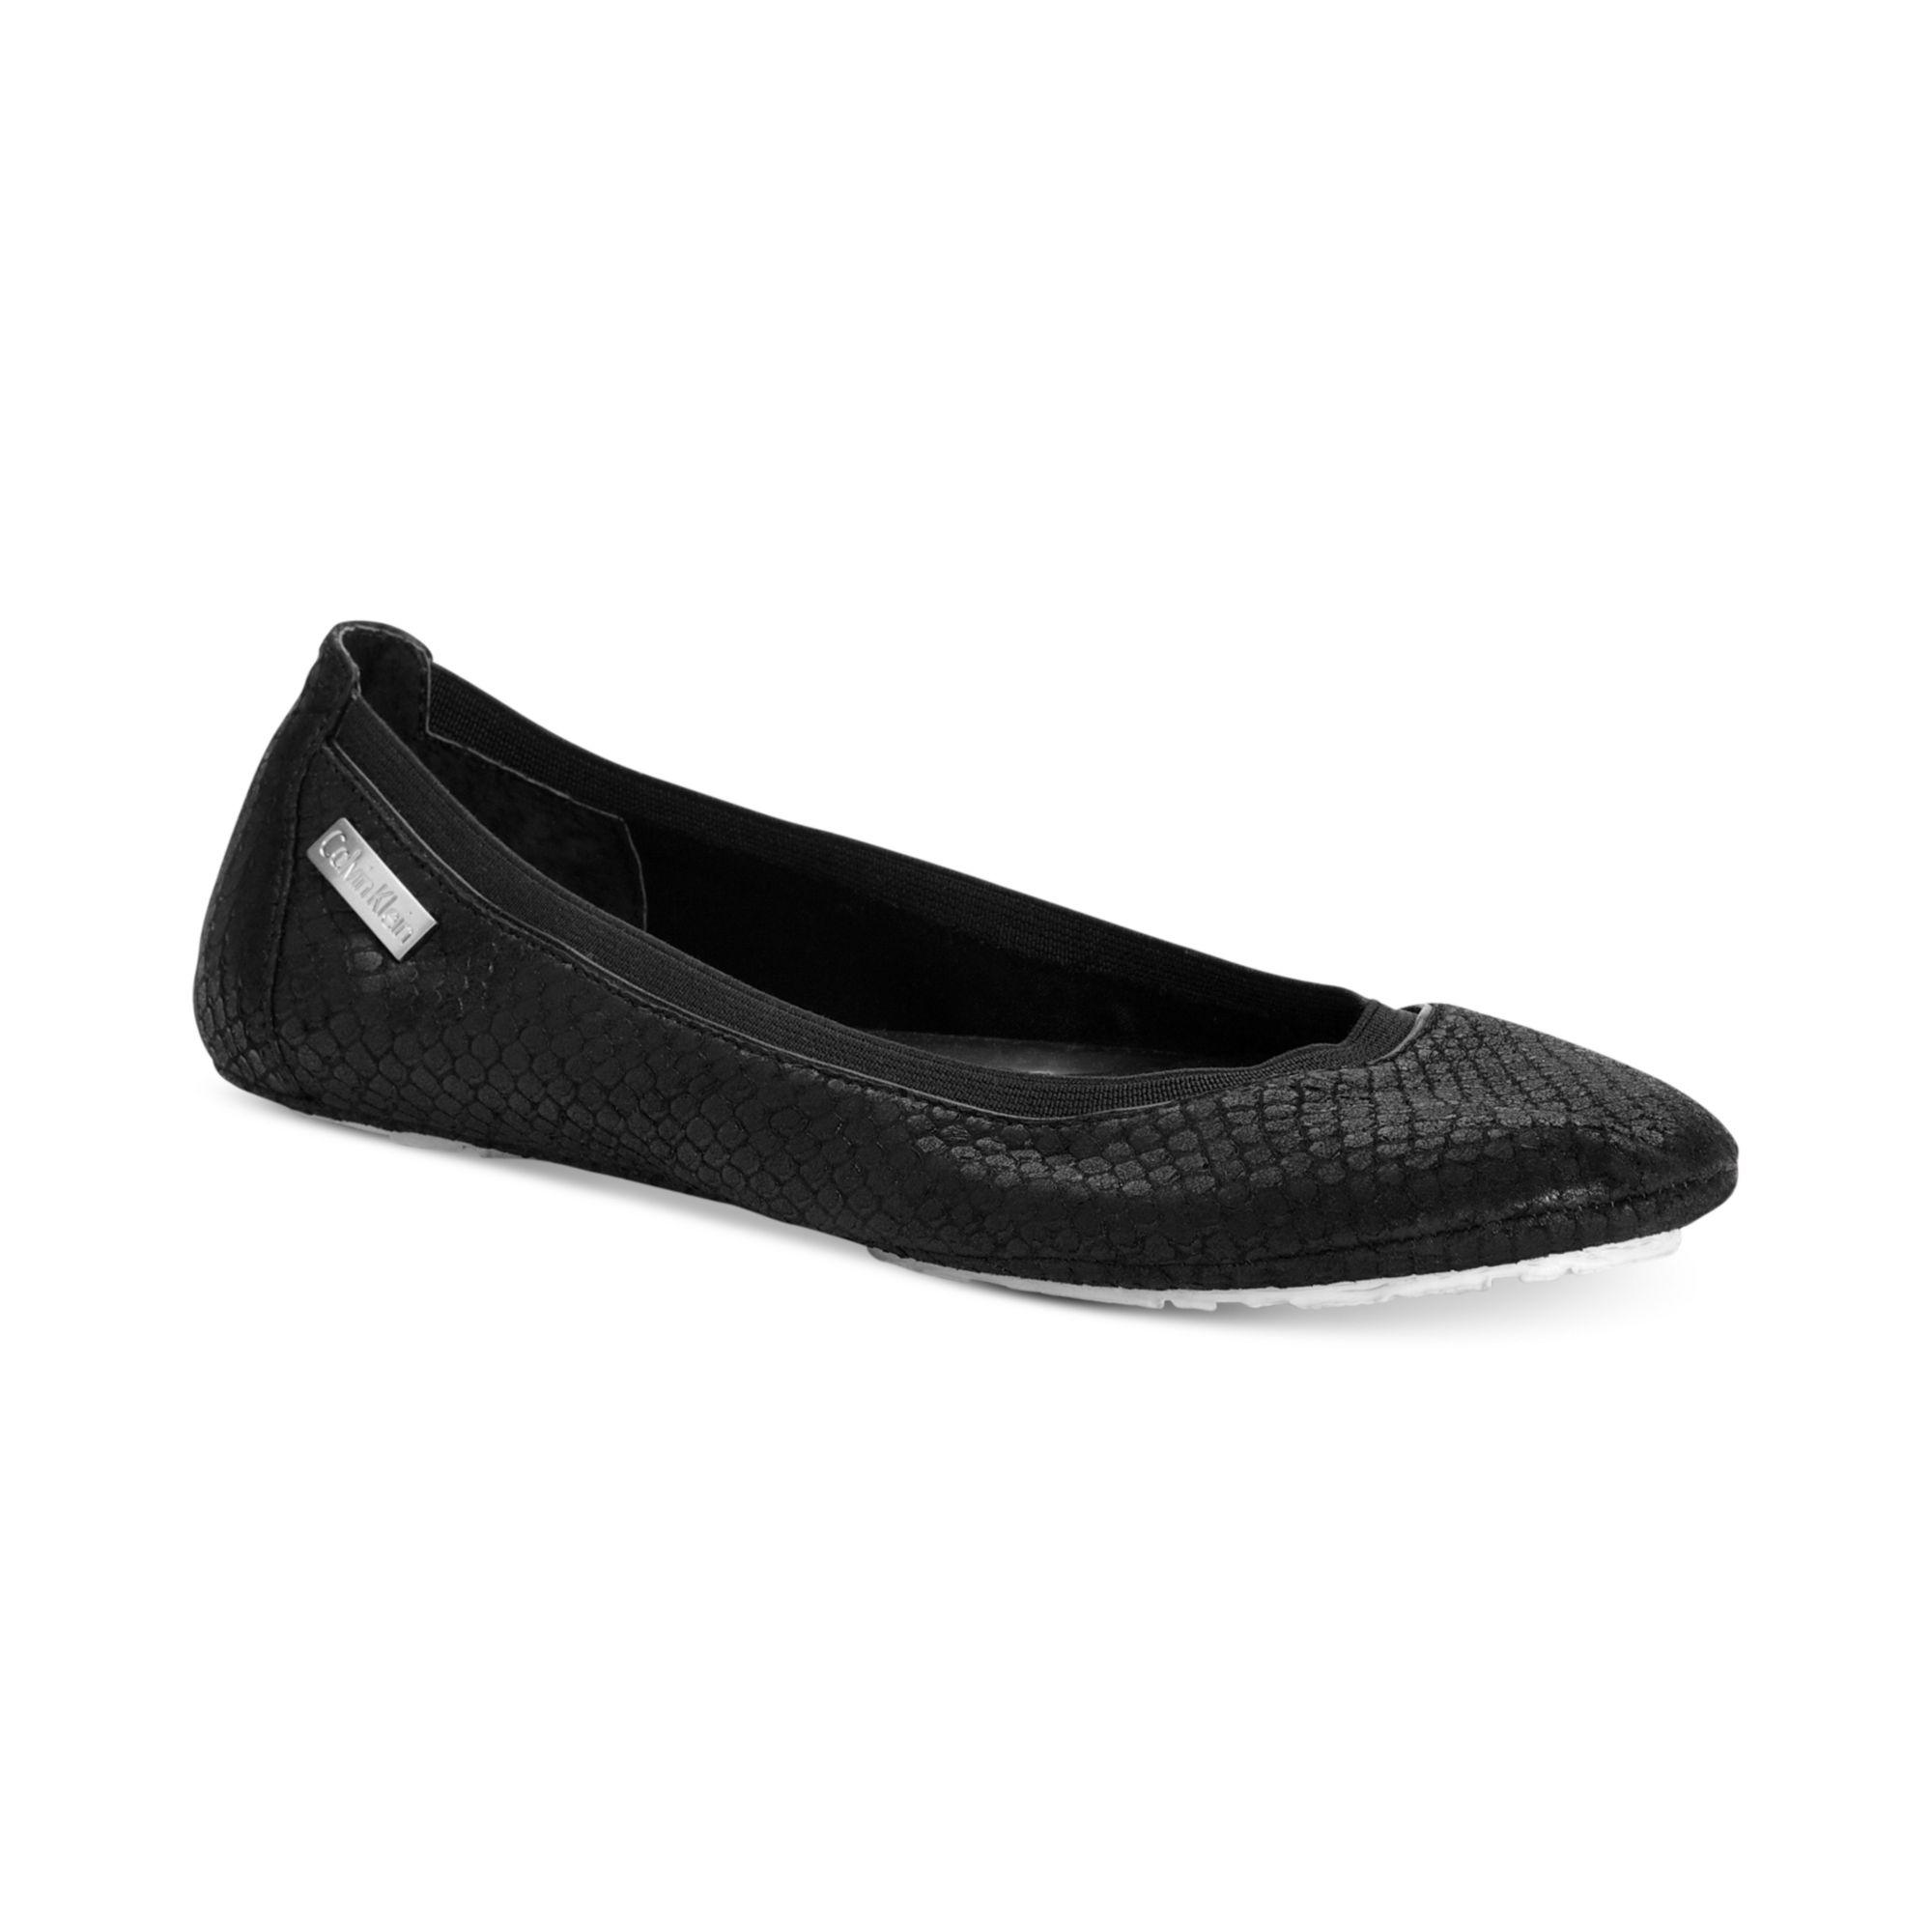 Steven Alan Womens Shoes